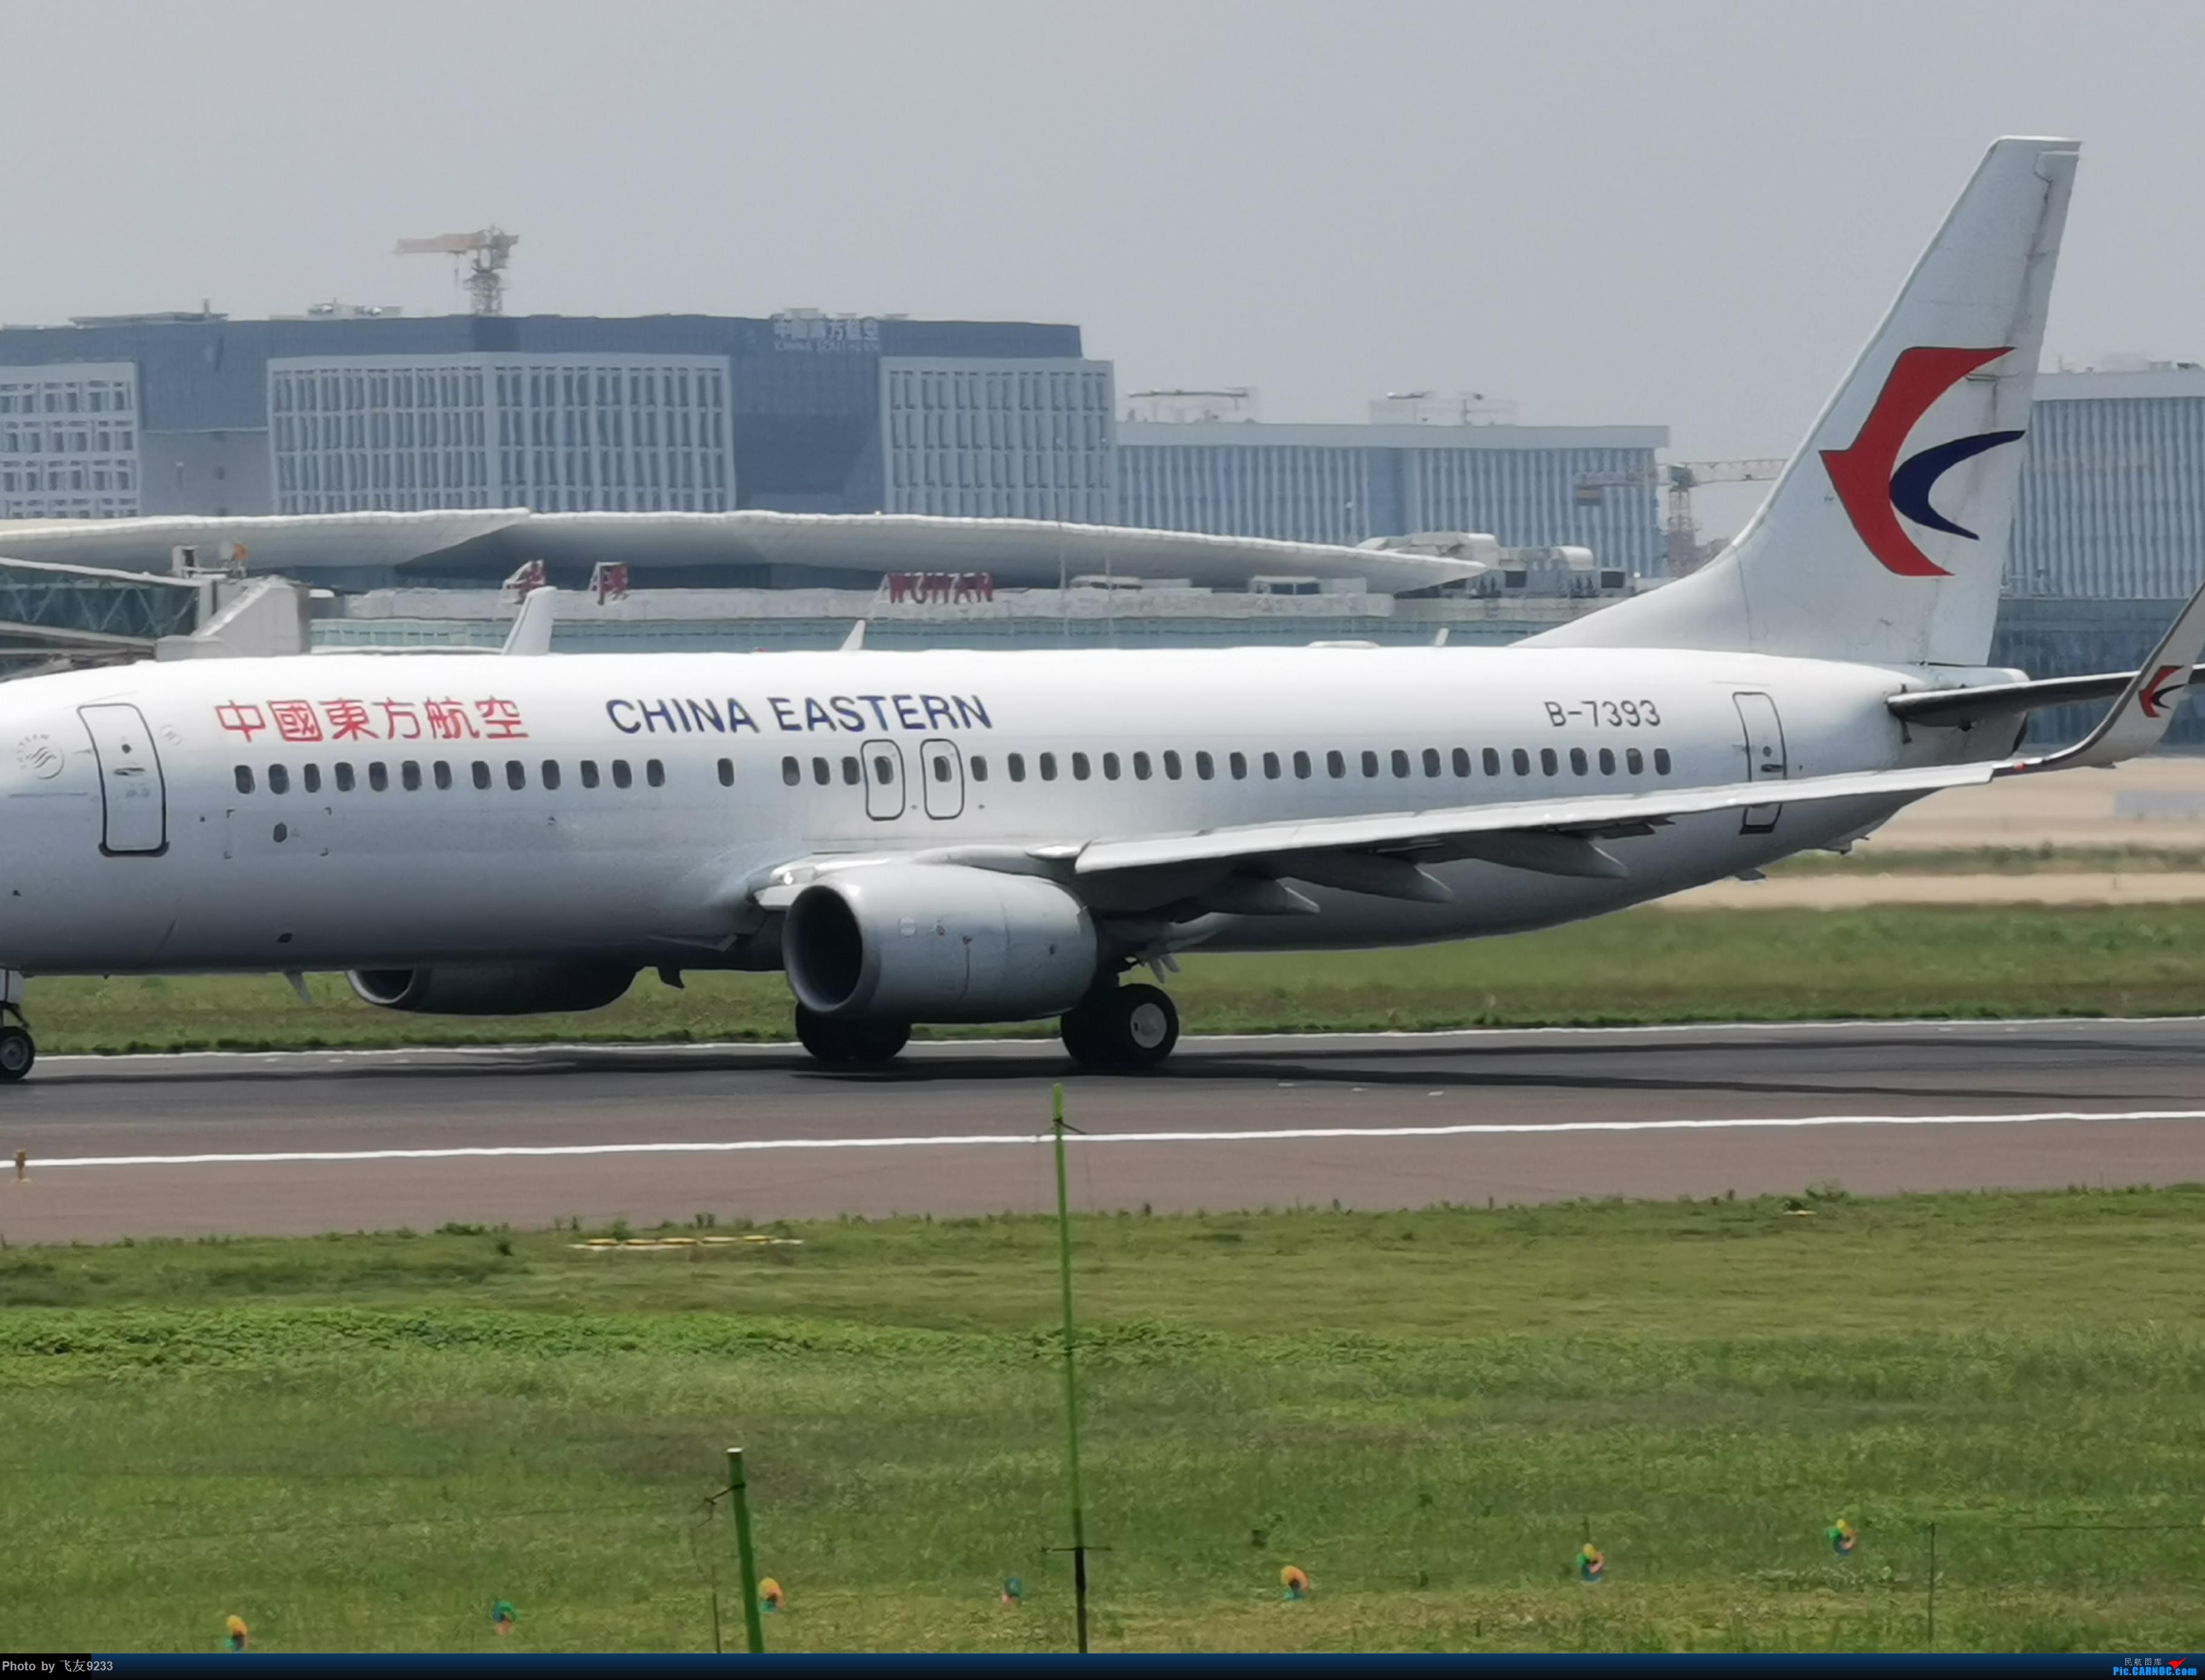 Re:[原创]武汉天河拍机之旅 BOEING 737-800 B-7393 中国武汉天河国际机场